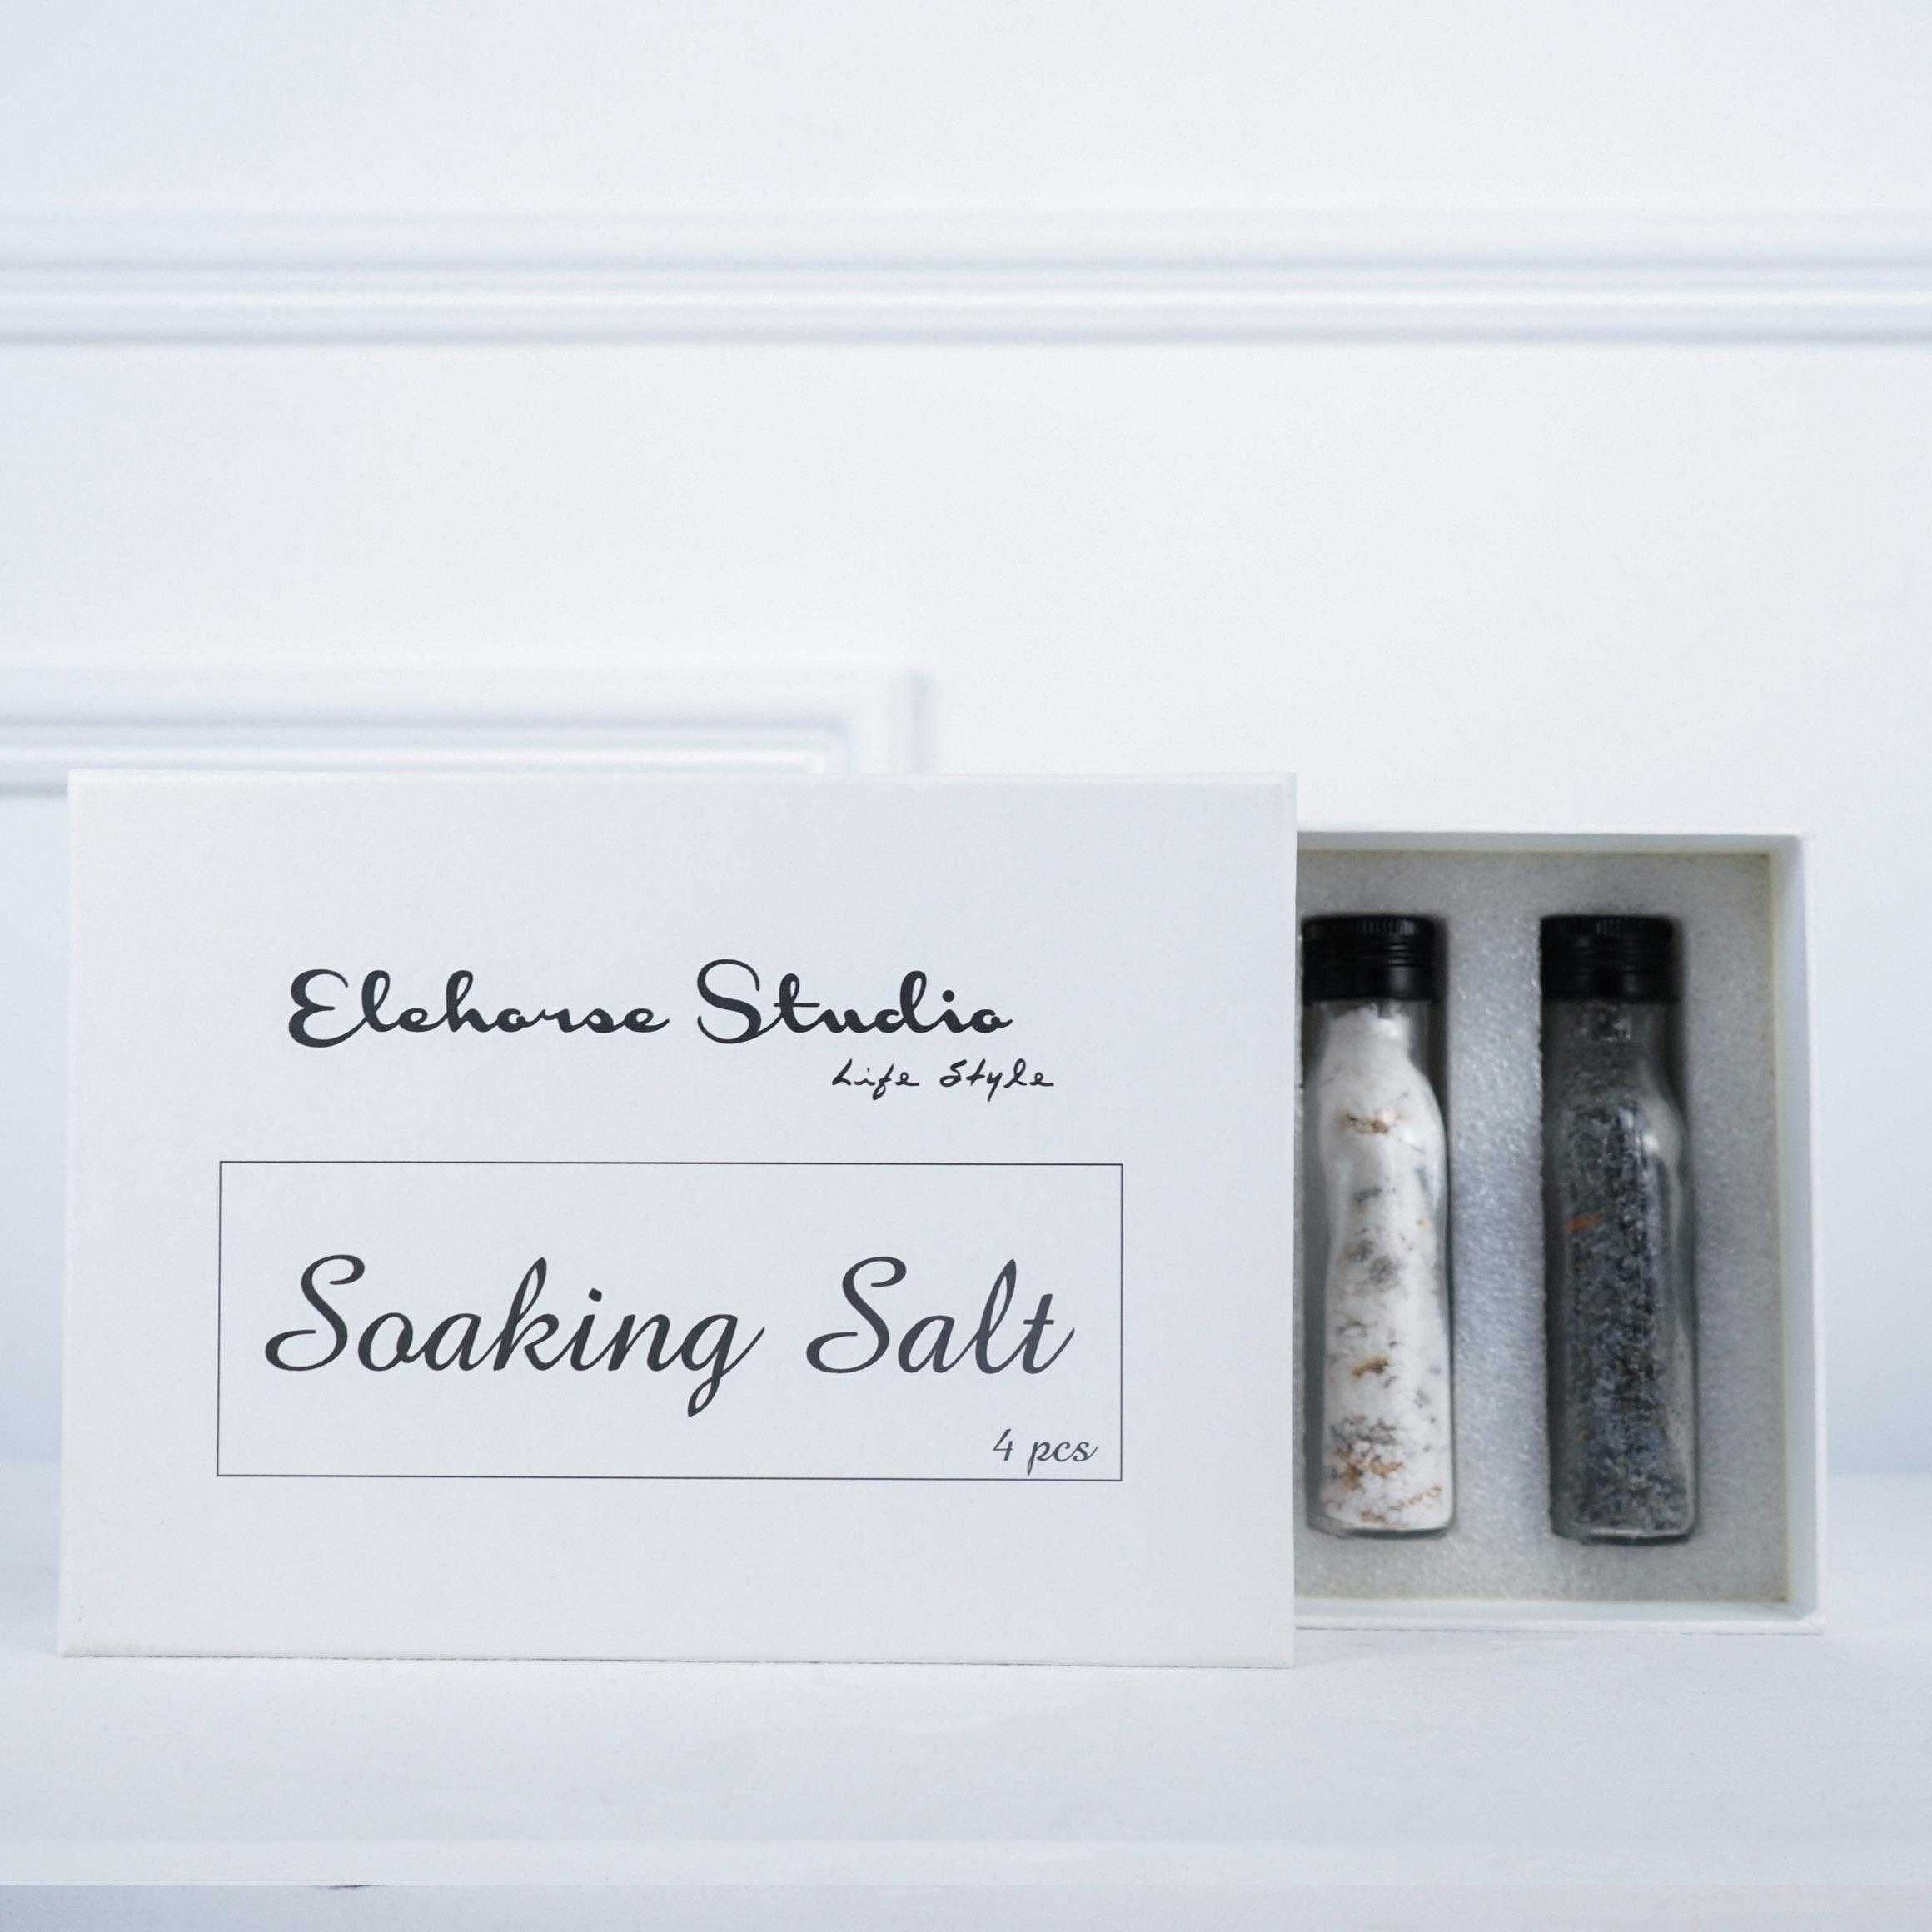 ElehorseStudio 身体浴盐 Soaking Salt 浴盐组合礼盒